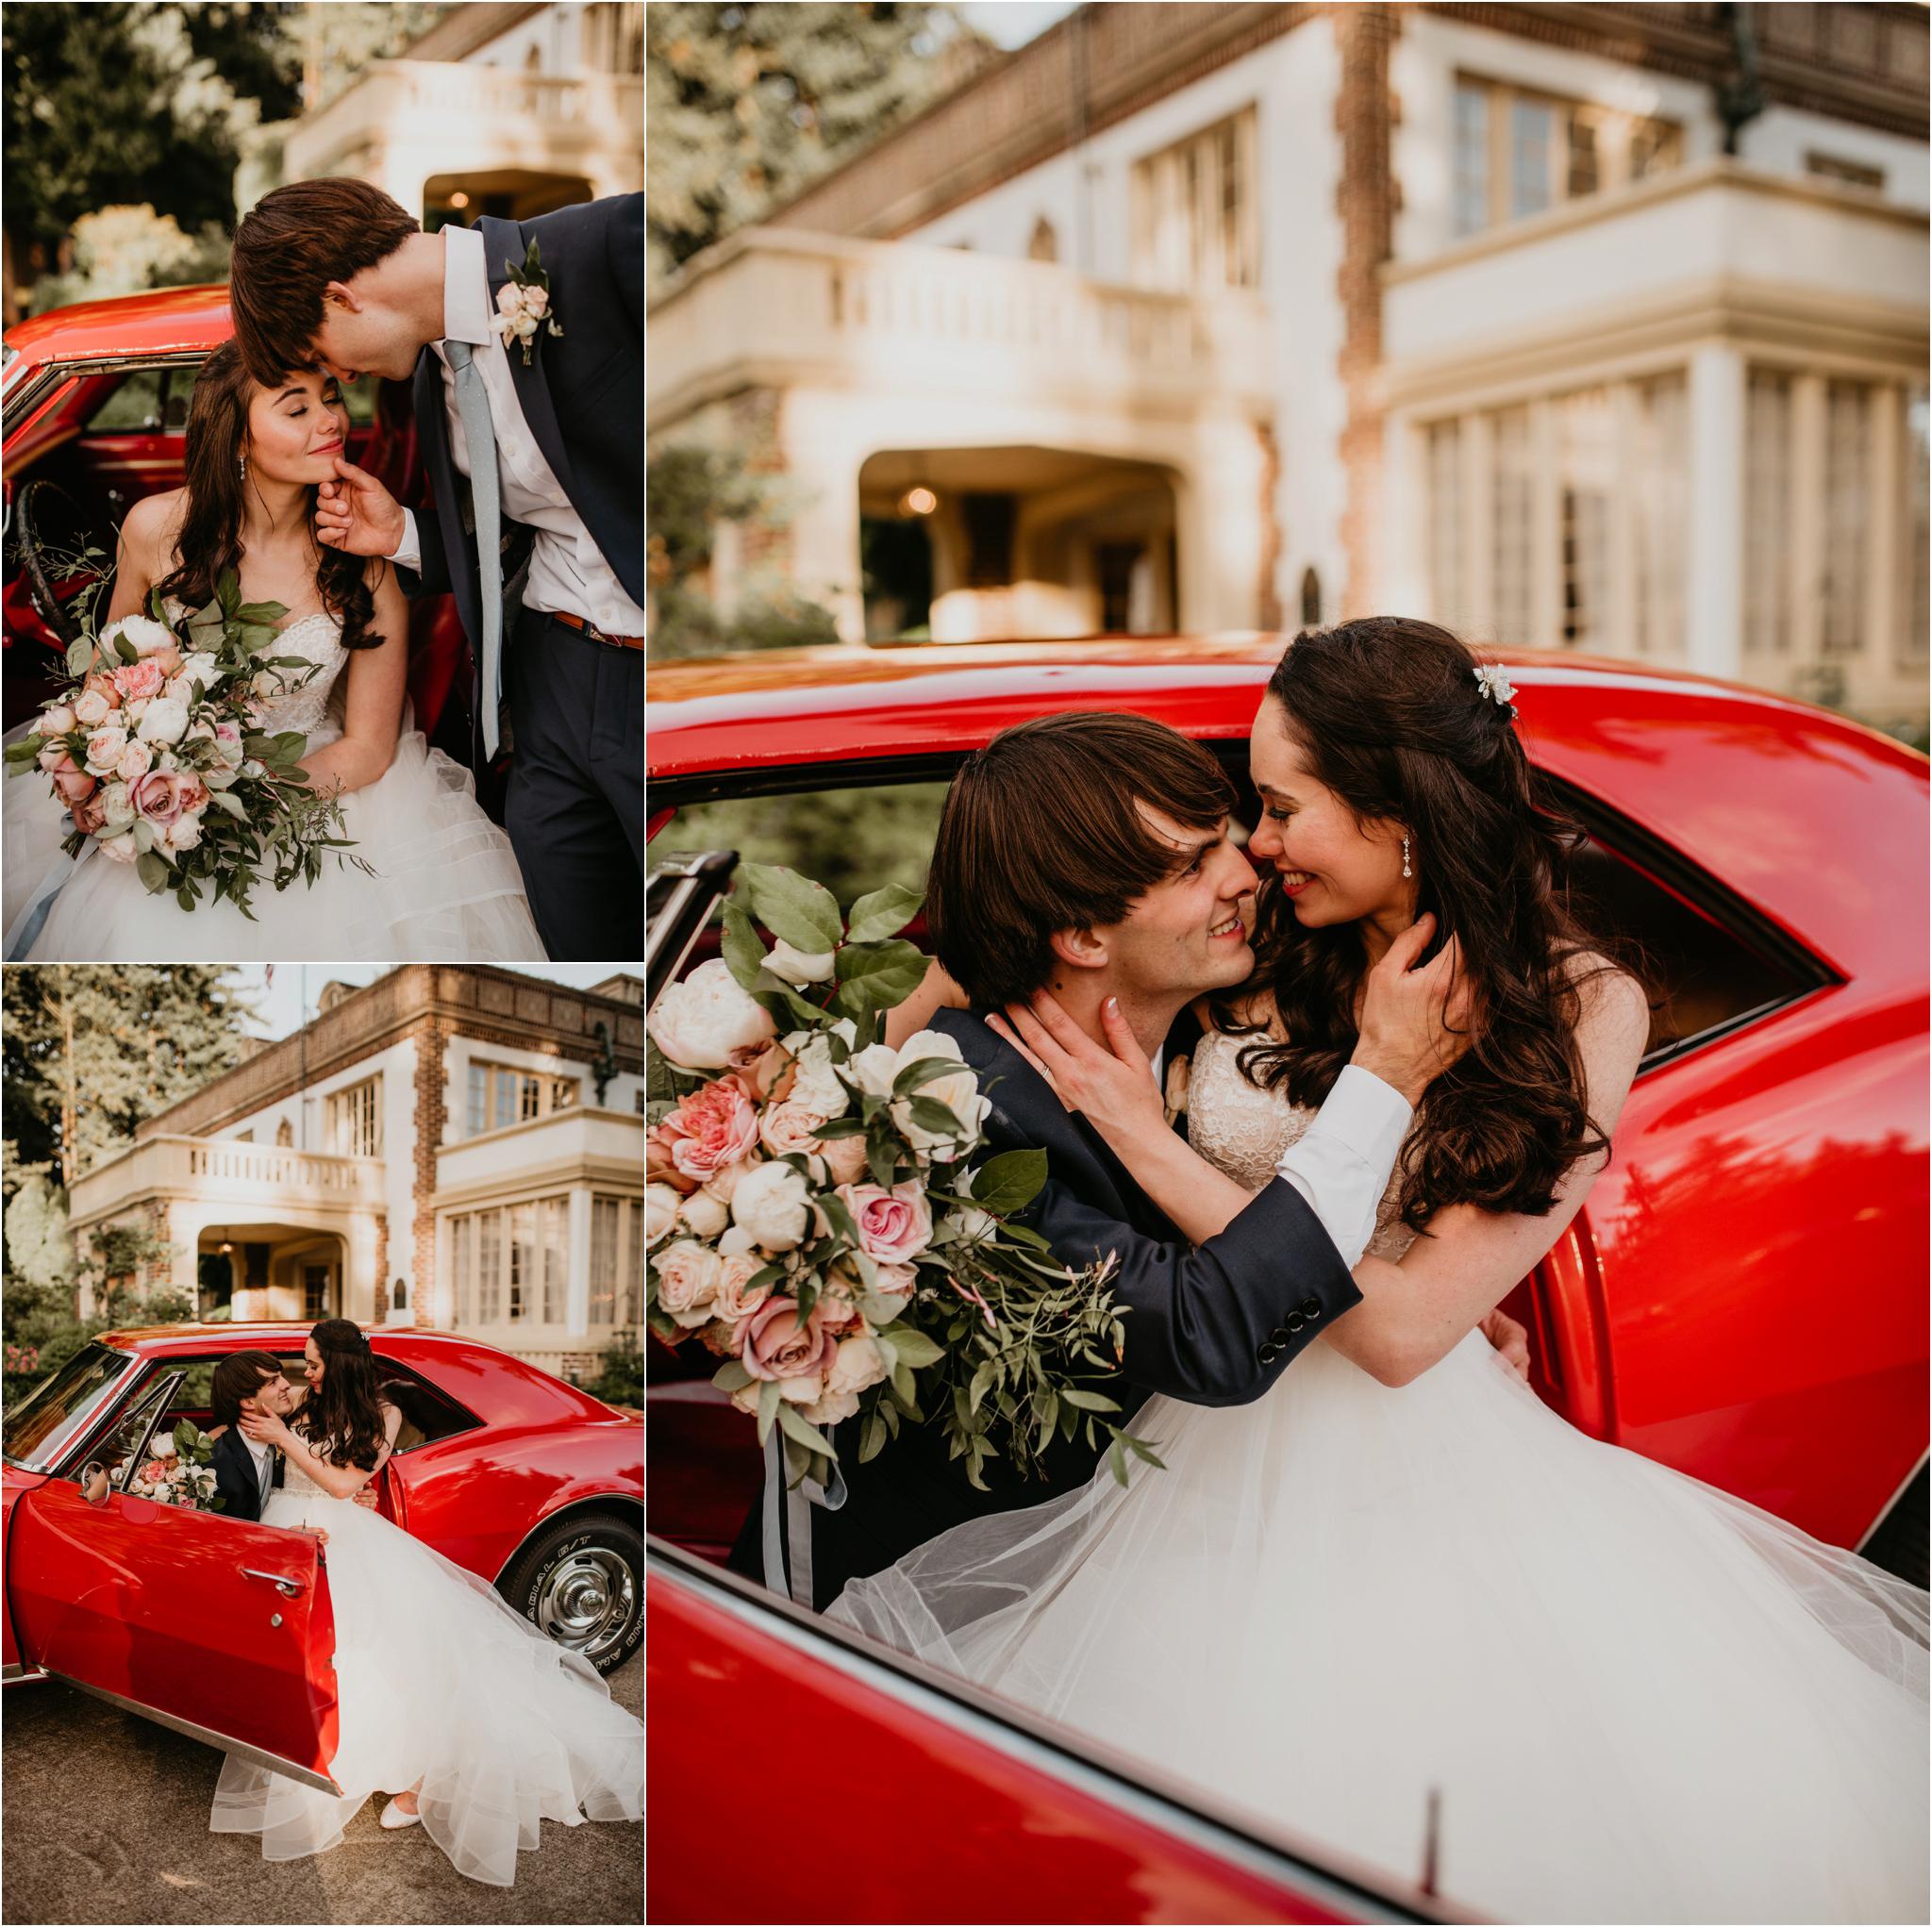 chance-and-ondrea-lairmont-manor-wedding-seattle-photographer-105.jpg